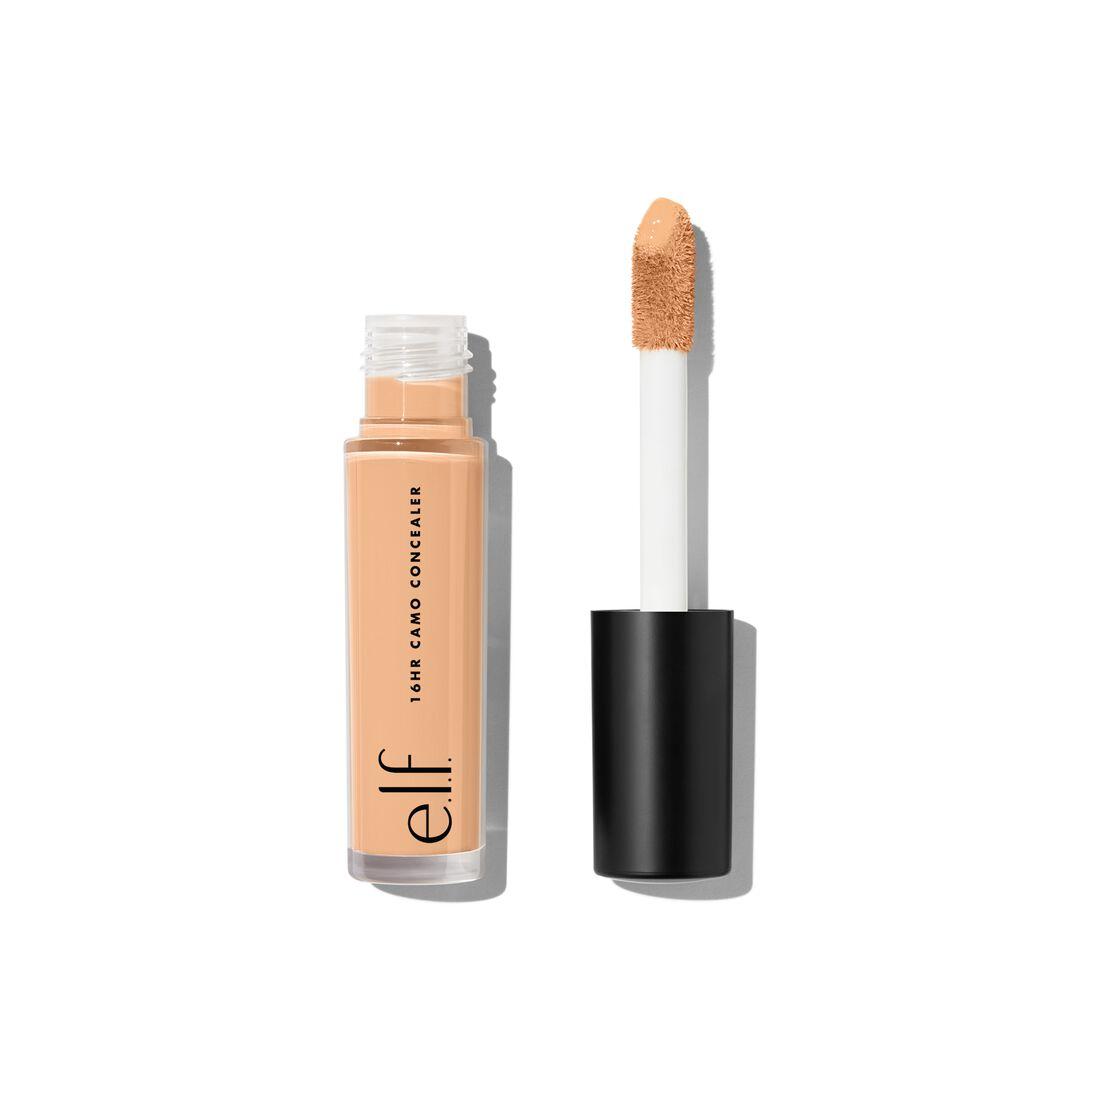 E.l.f Cosmetics - 16HR Camo Concealer